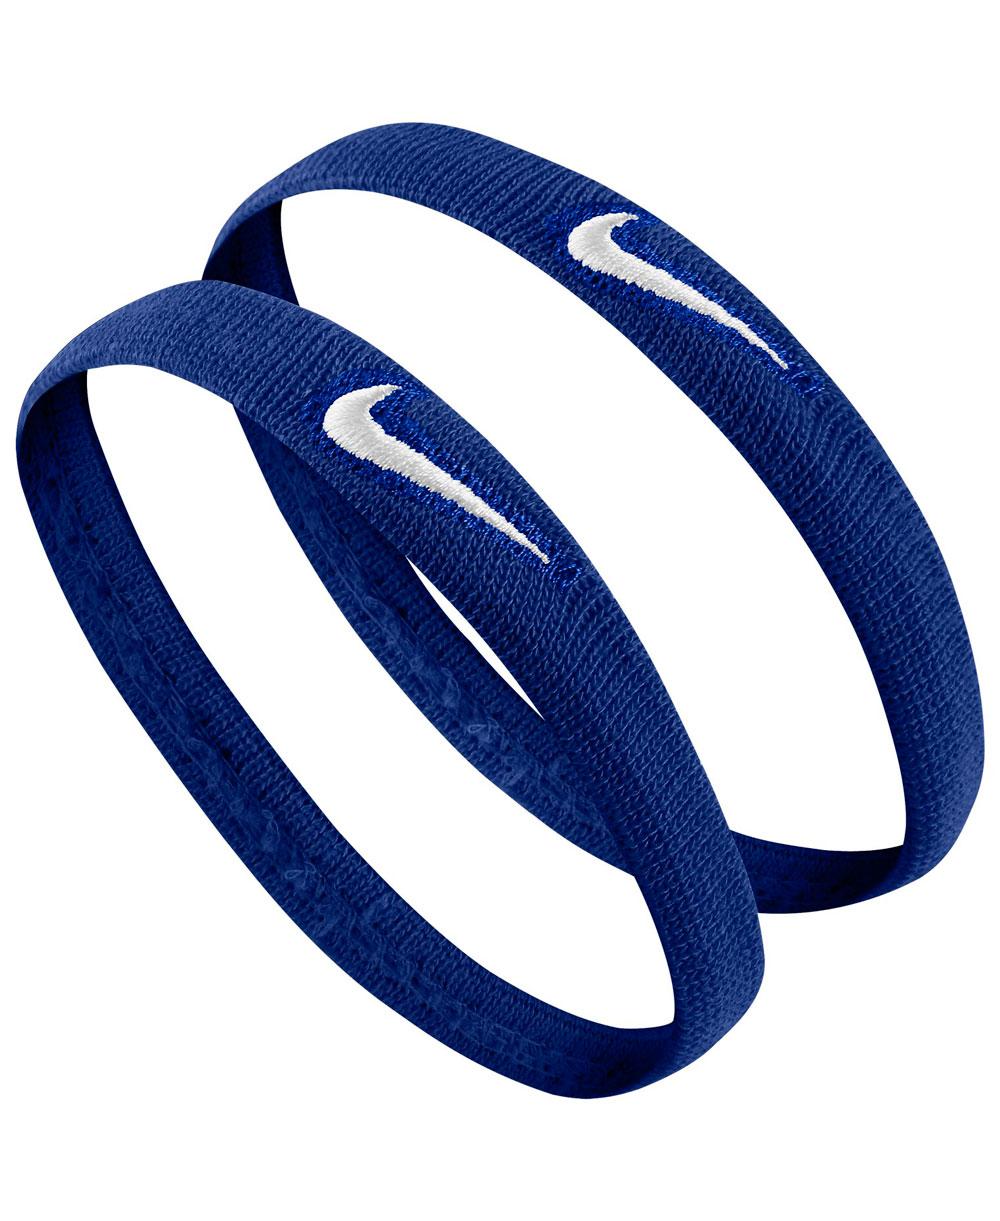 Dri-FIT Skinny Bandas para Biceps Blue